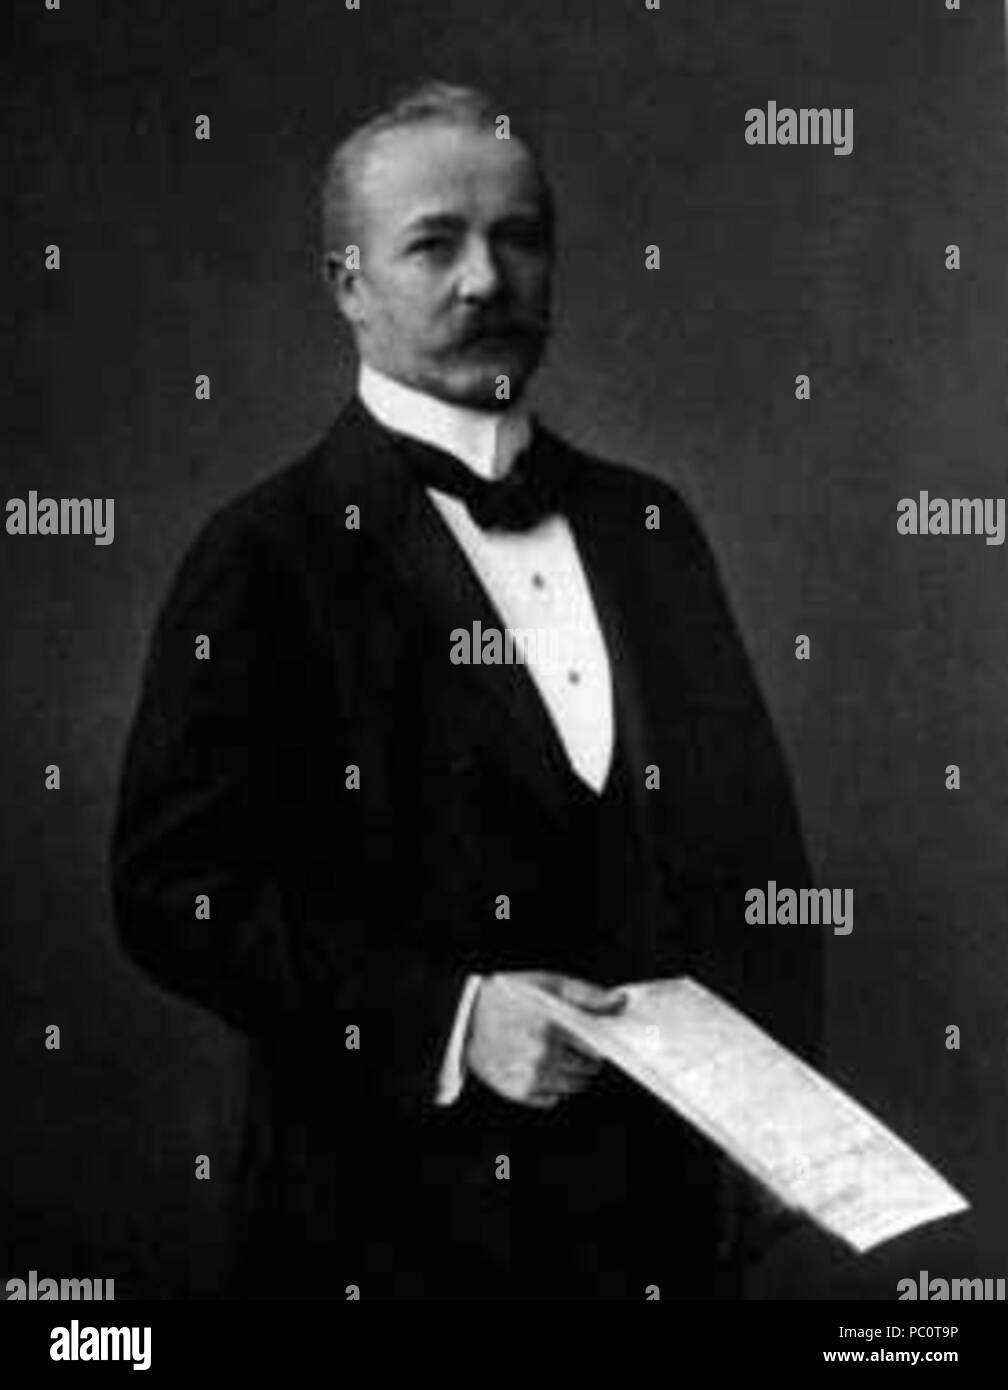 336 Karl Supf - german entrepreneur and colonialist - Stock Image